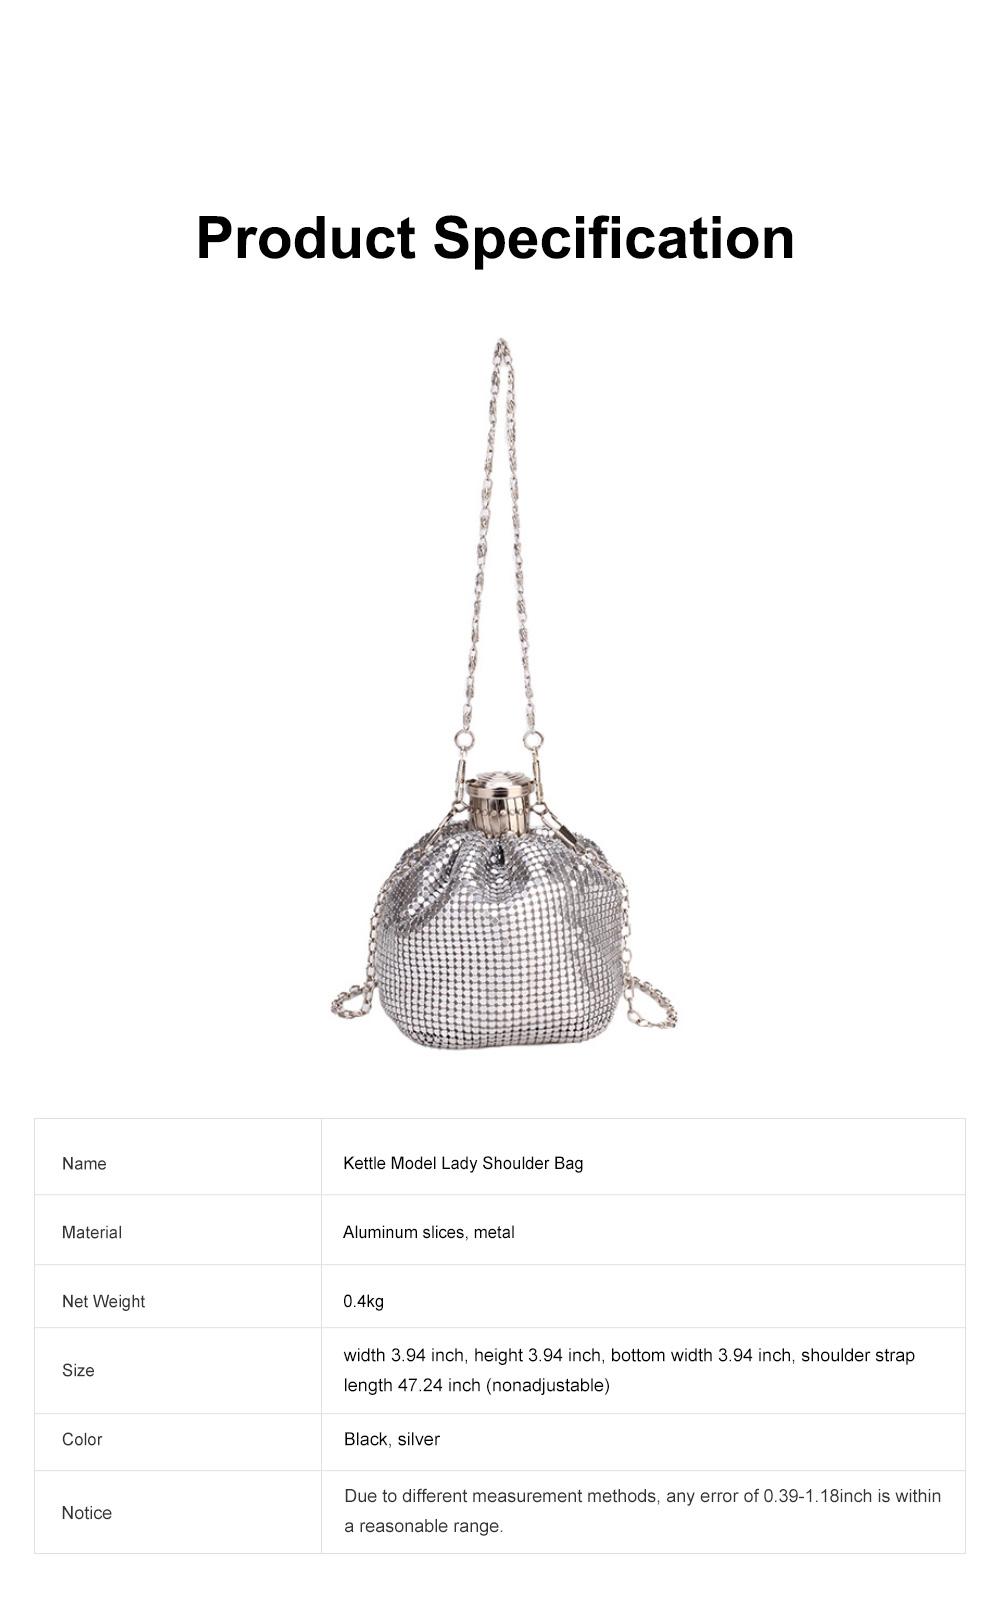 Creative Shiny Aluminum Slices Kettle Model Lady Shoulder Bag, Fashion Stylish Wine Pot Jar Hand Bag for Women 5